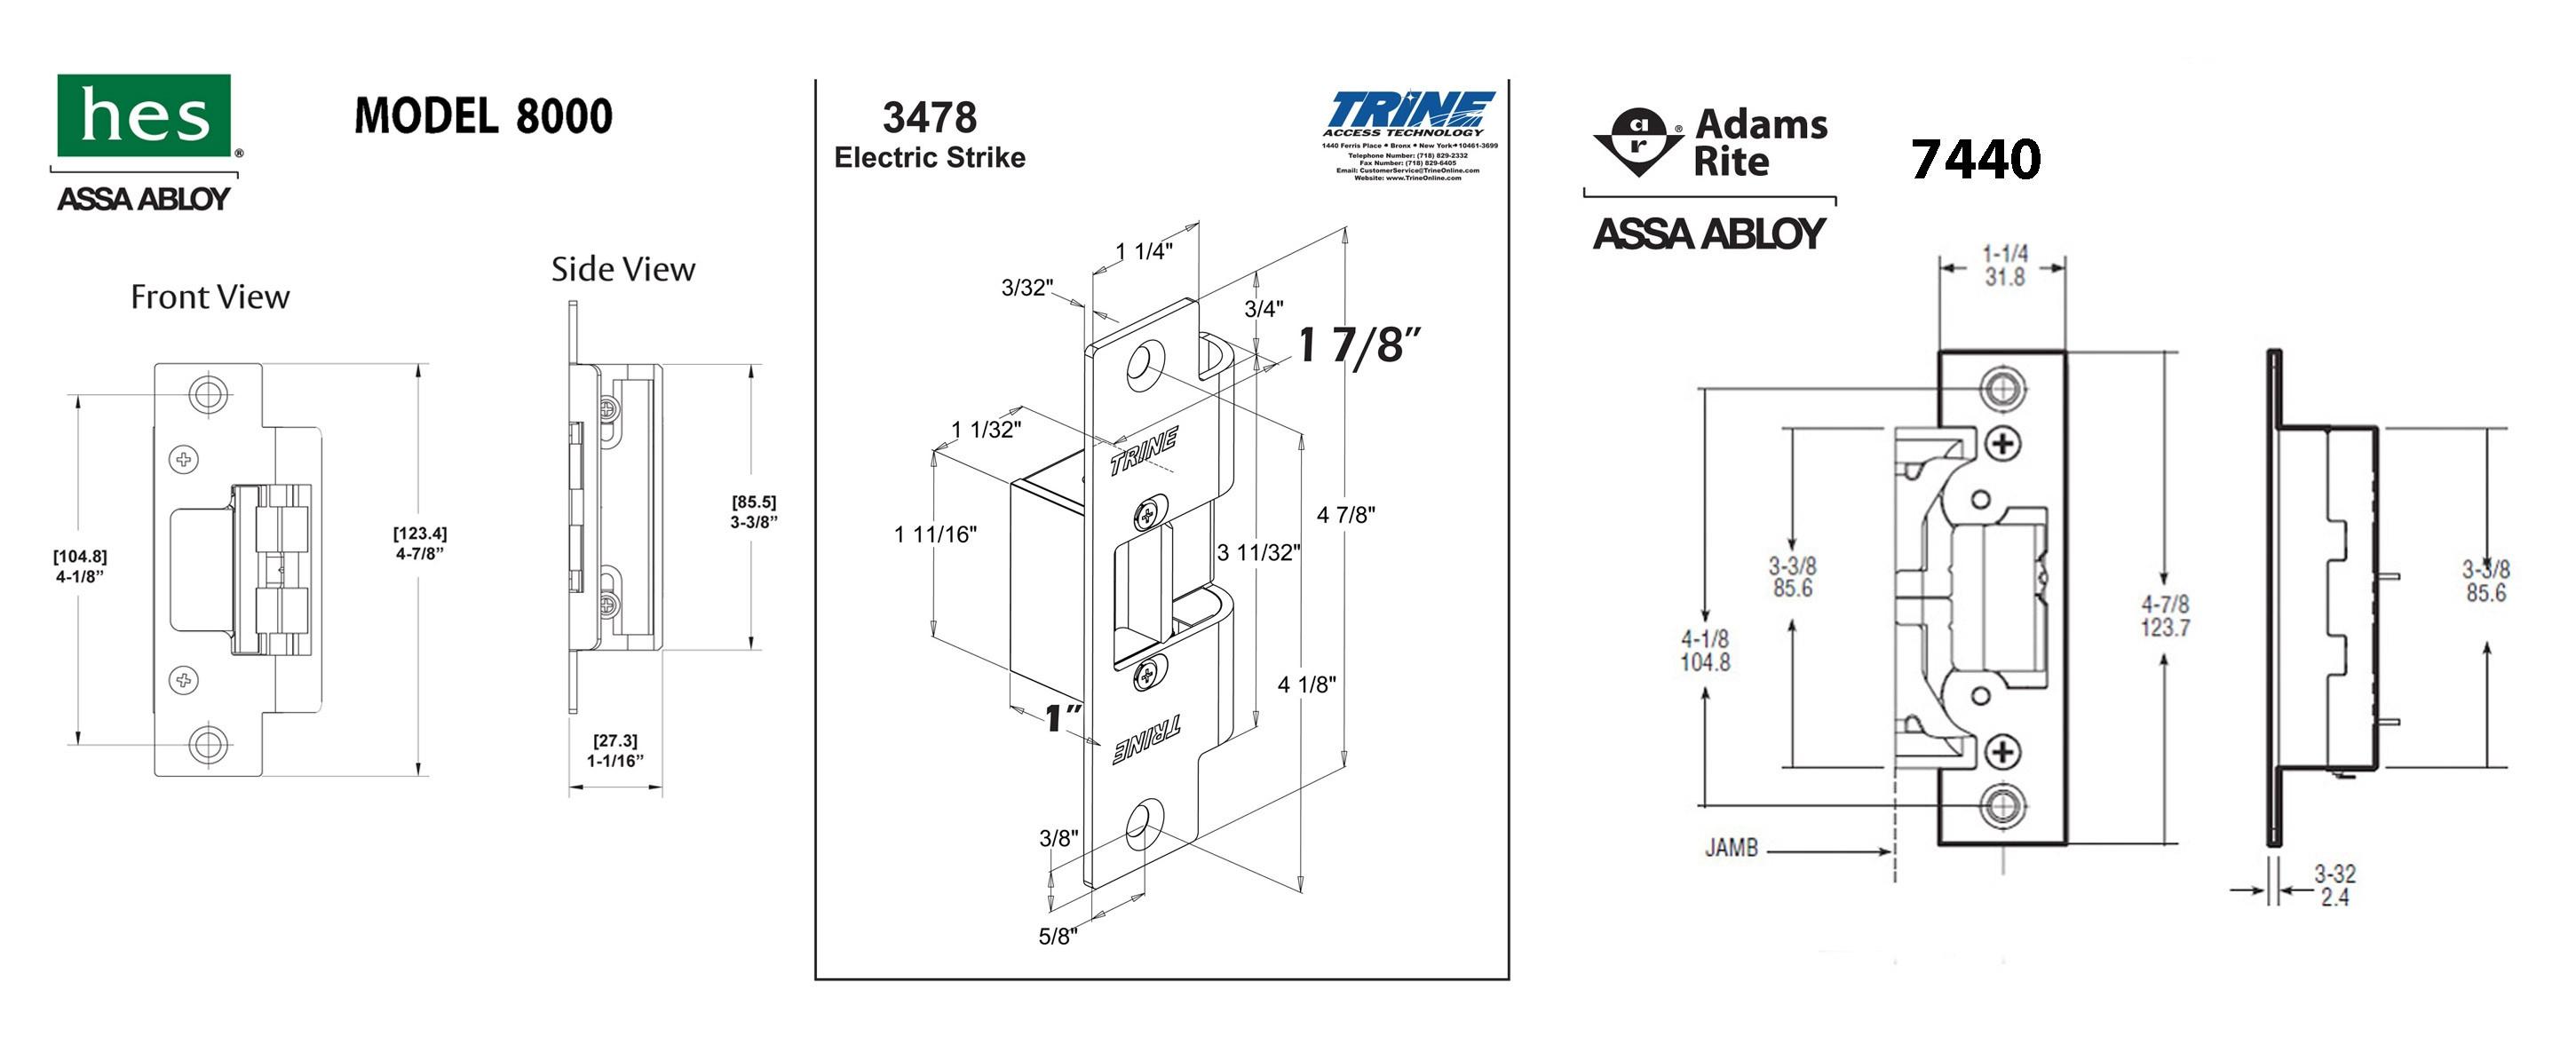 adams rite electric strike wiring diagram Collection-Wiring Diagram for Magnetic Door Lock Fresh Hes 5000 Series Electric Strike Wiring Diagram 11-f